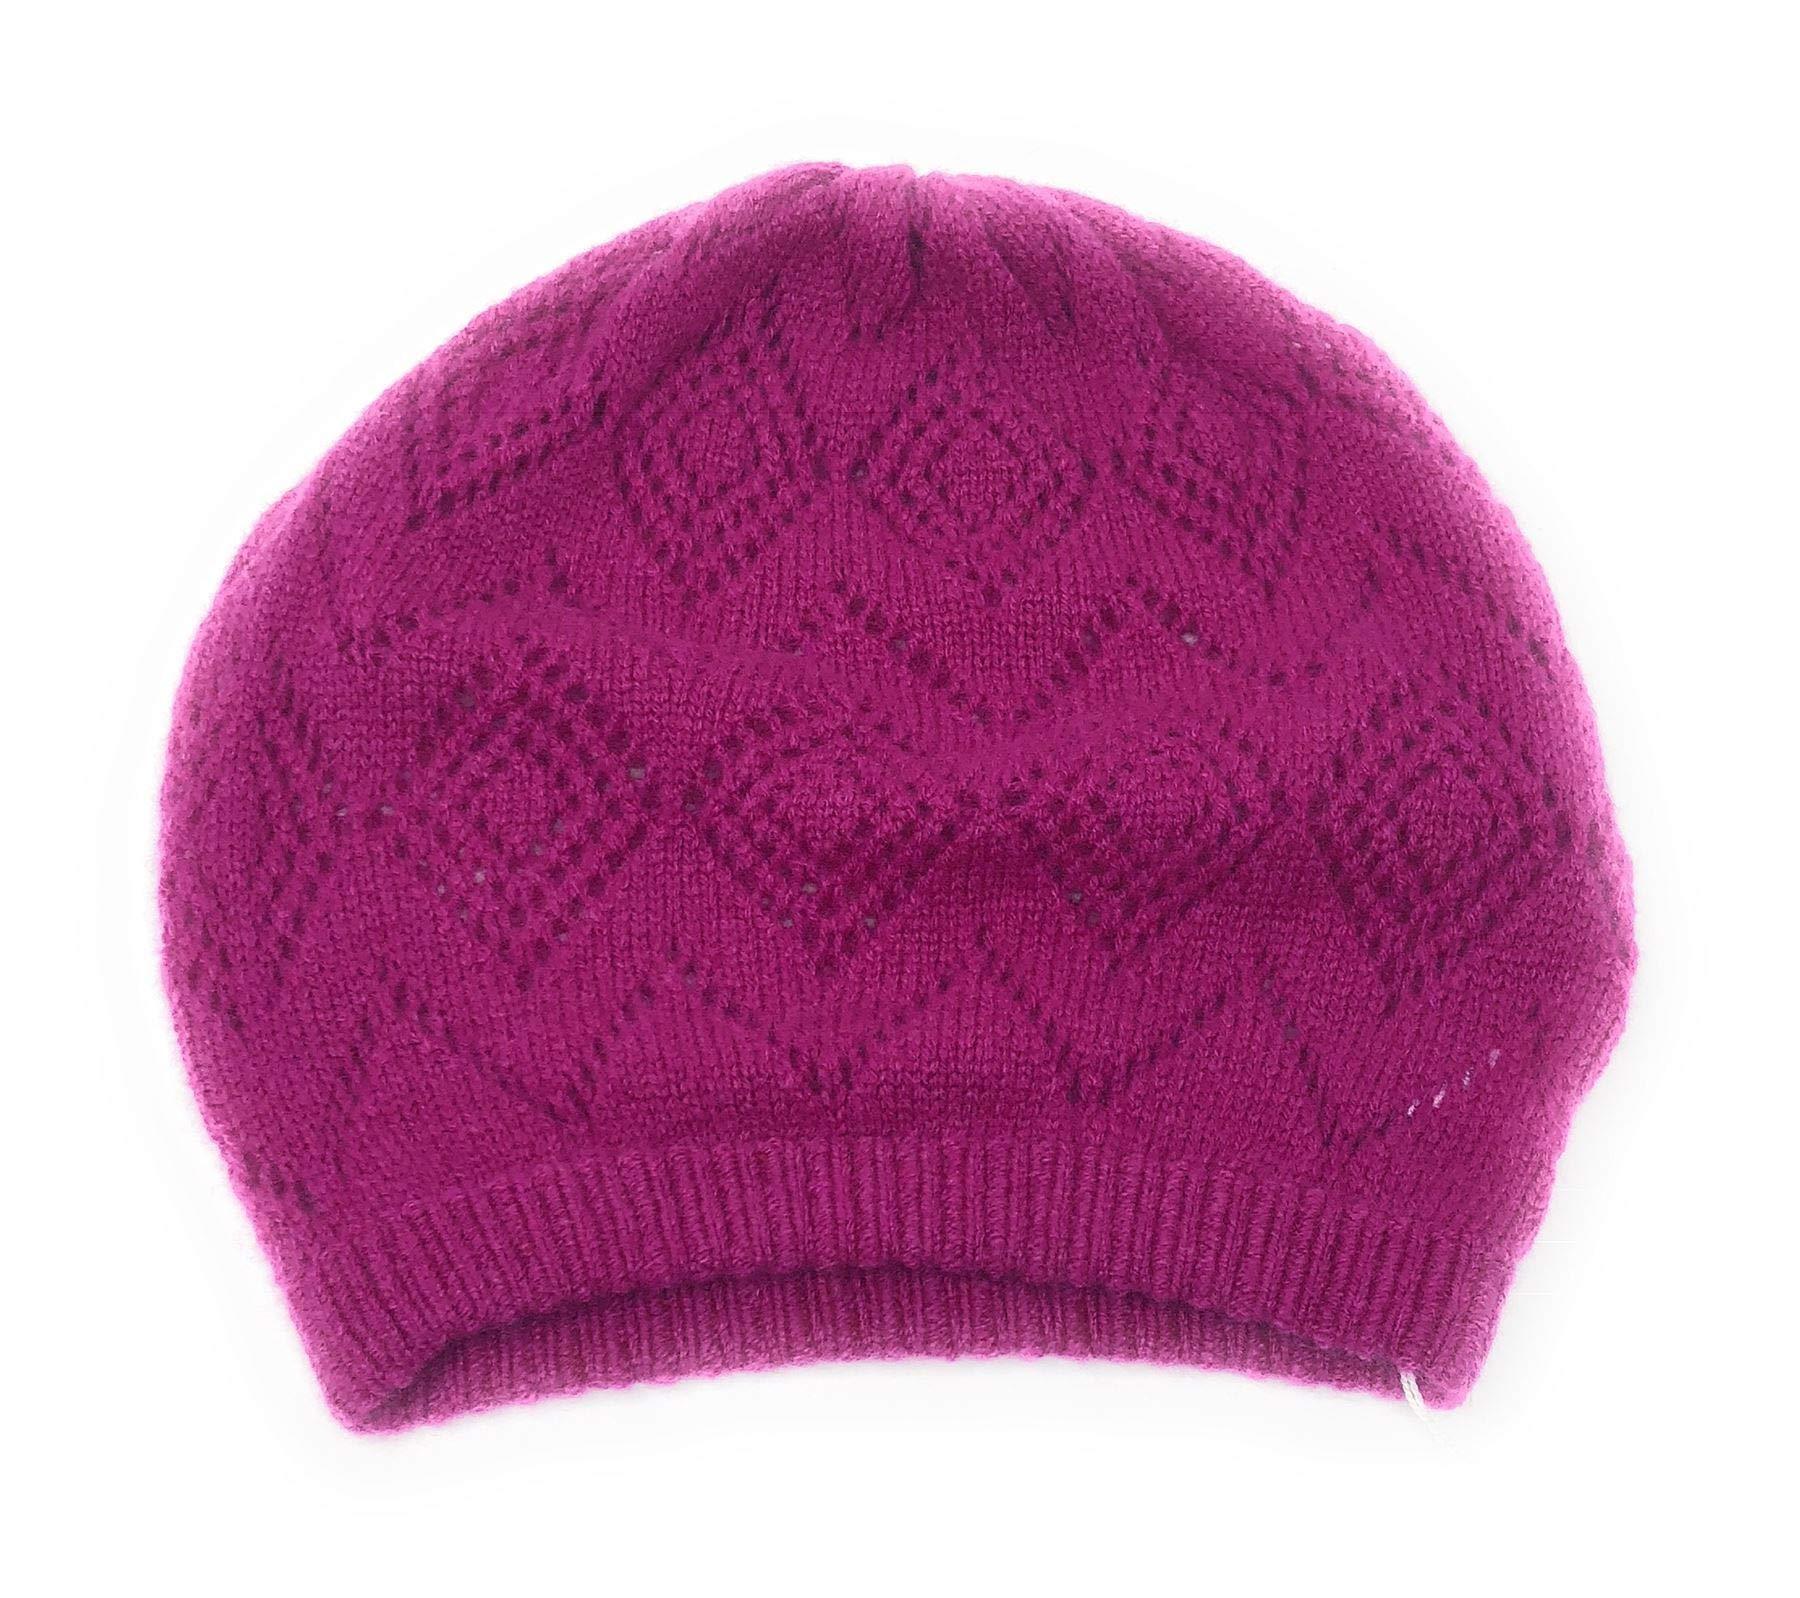 100% Cashmere Ladies Lacy Knit Beanie Hat - Cerise Pink